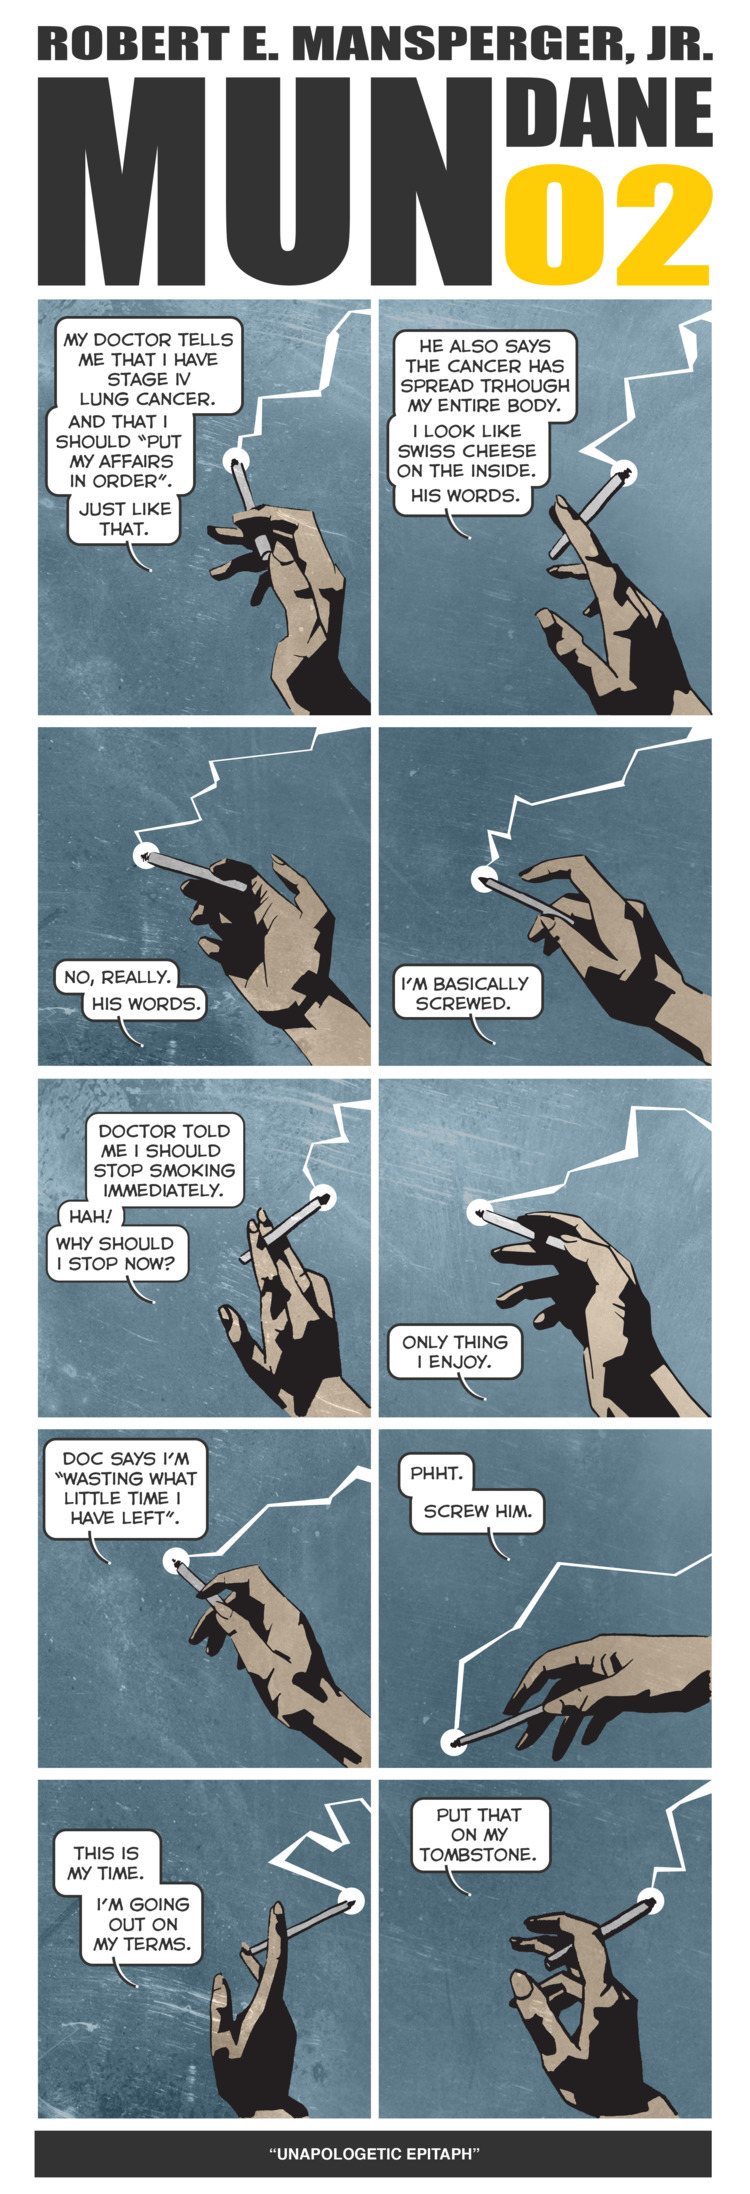 MUNDANE 02 comic strip - rmansperger | ello